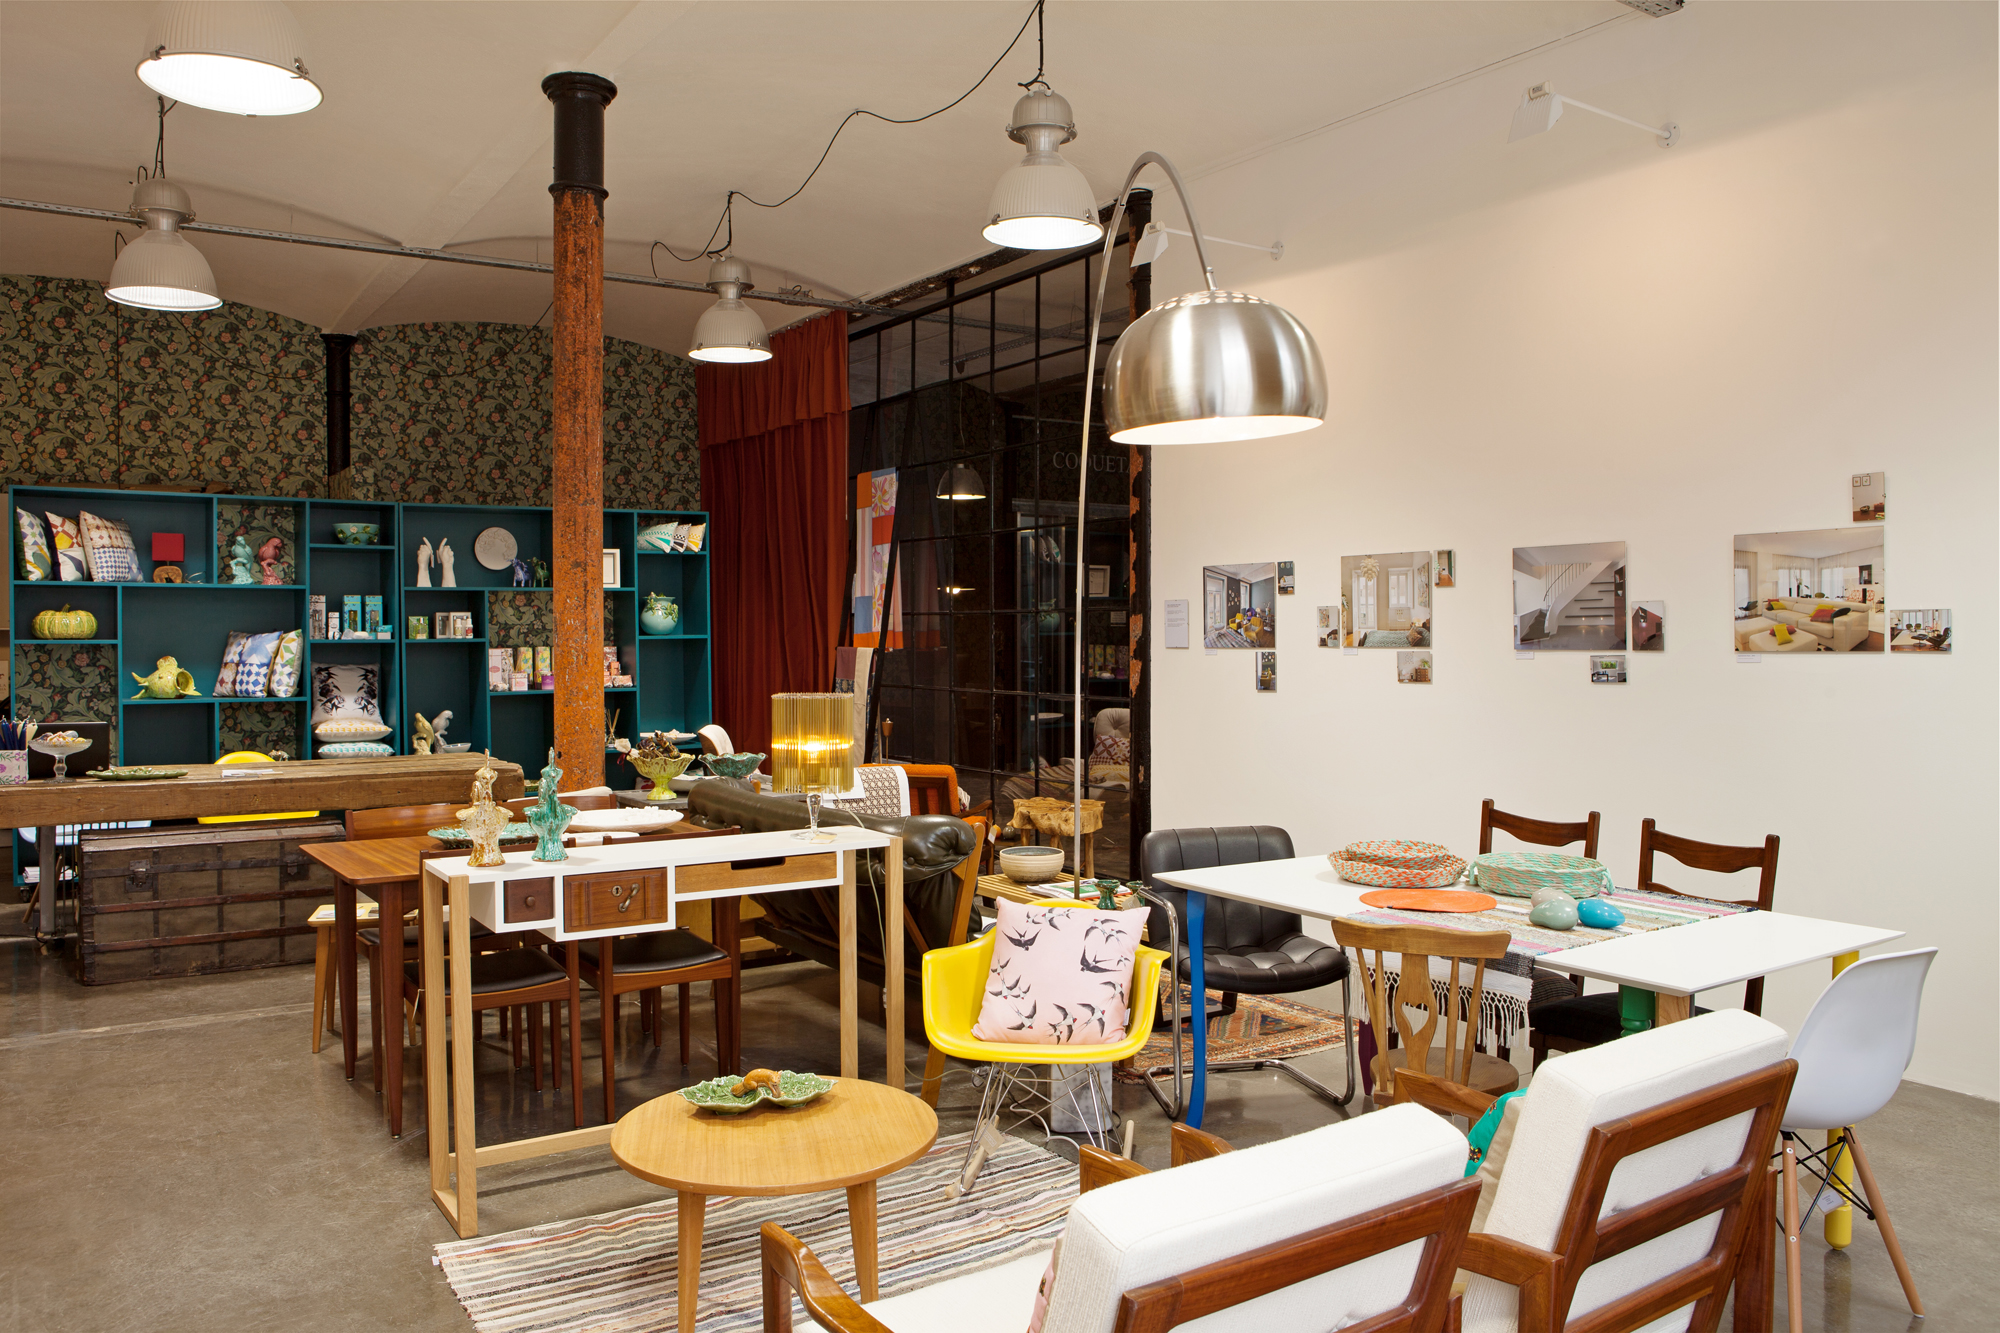 100 60s interior design interior design archives for Local interior decorators